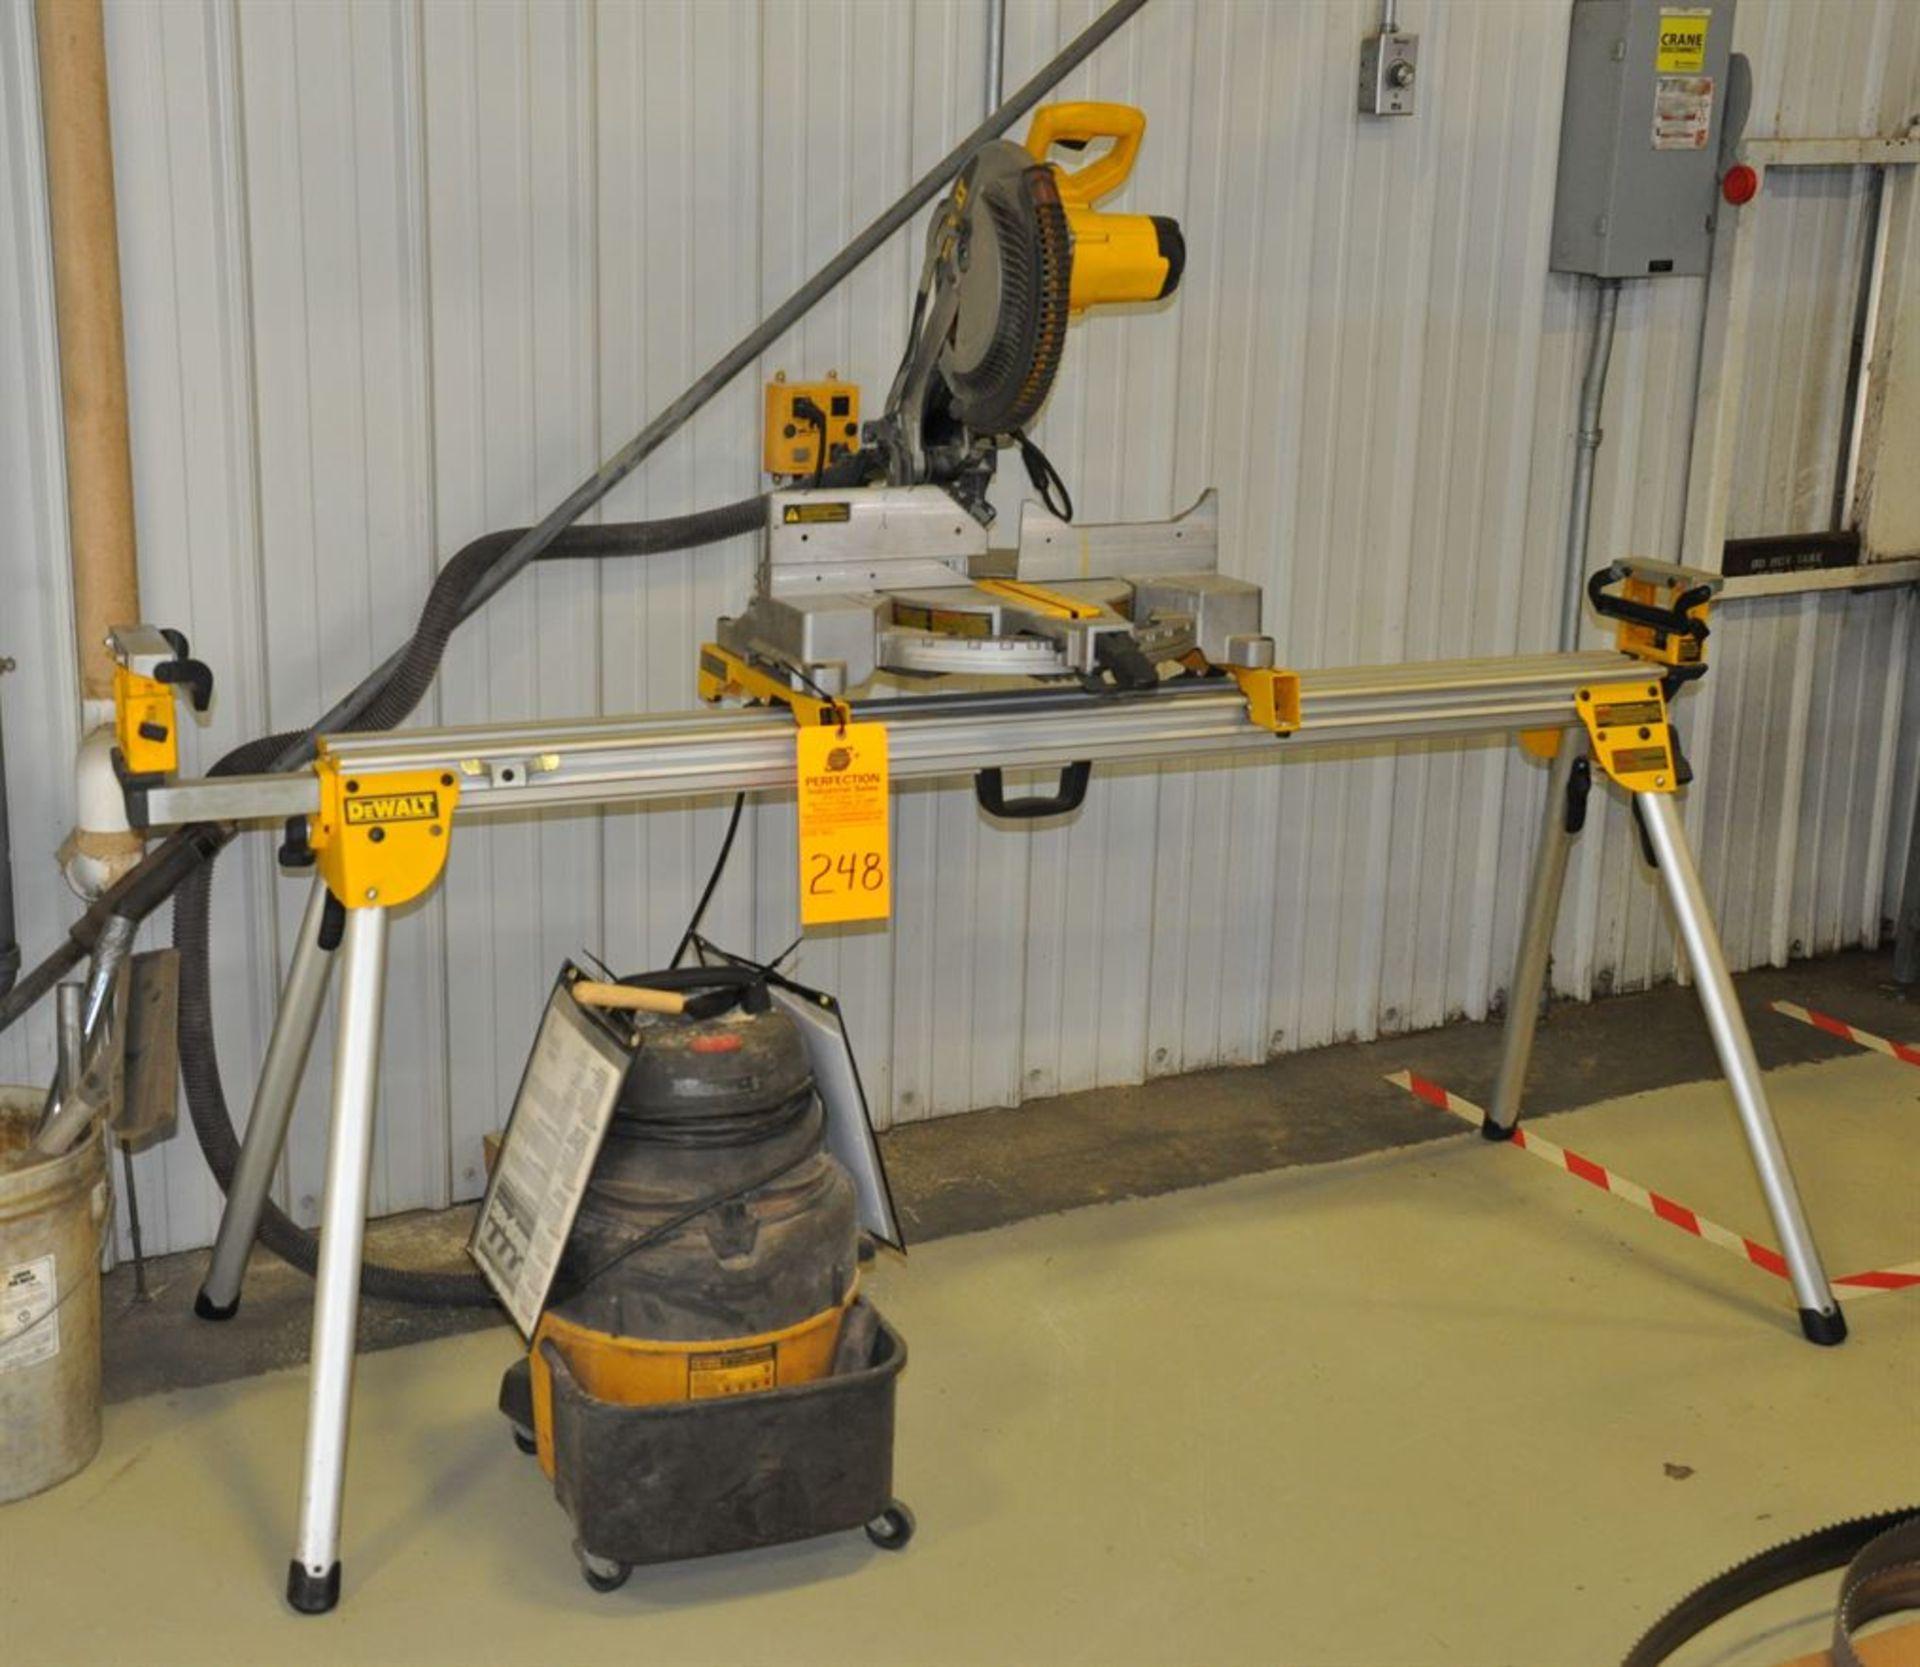 DeWalt Mitre Saw w/ stand and Vacuum